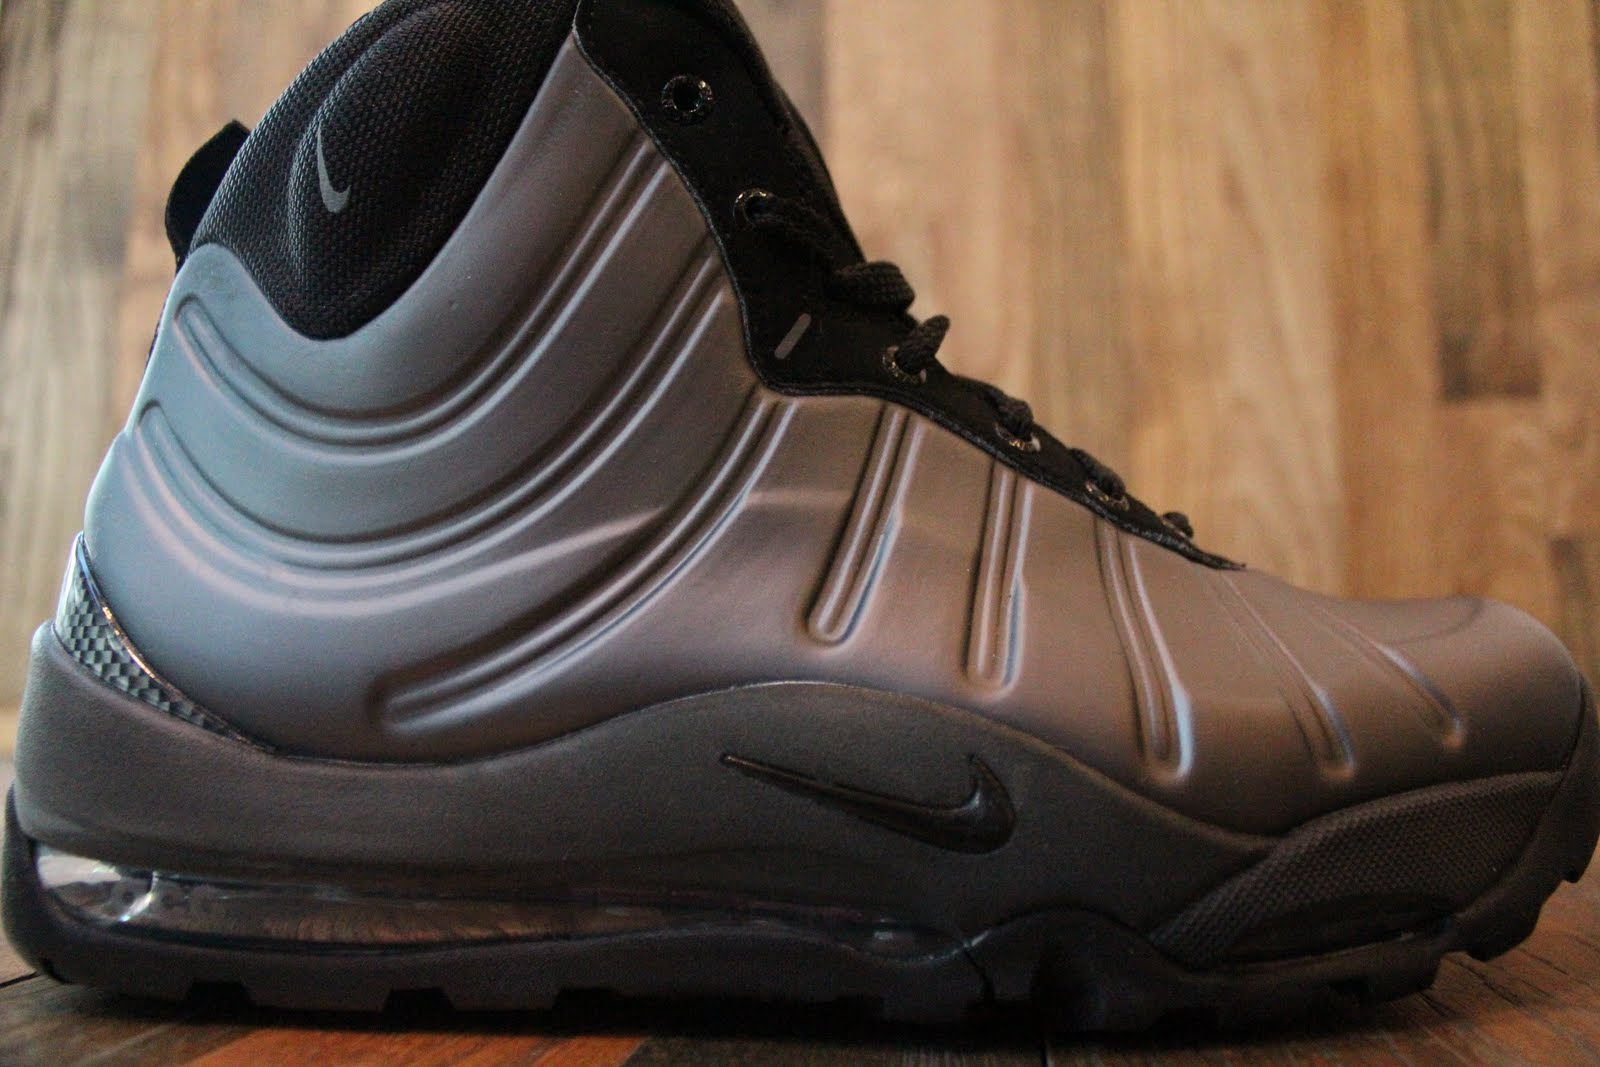 7b90d1f8ee43 Nike ACG Air Max Posite Bakin Boot Metallic Dark Grey Black-Dark Grey-Team  Orange 415327-008. November 2011